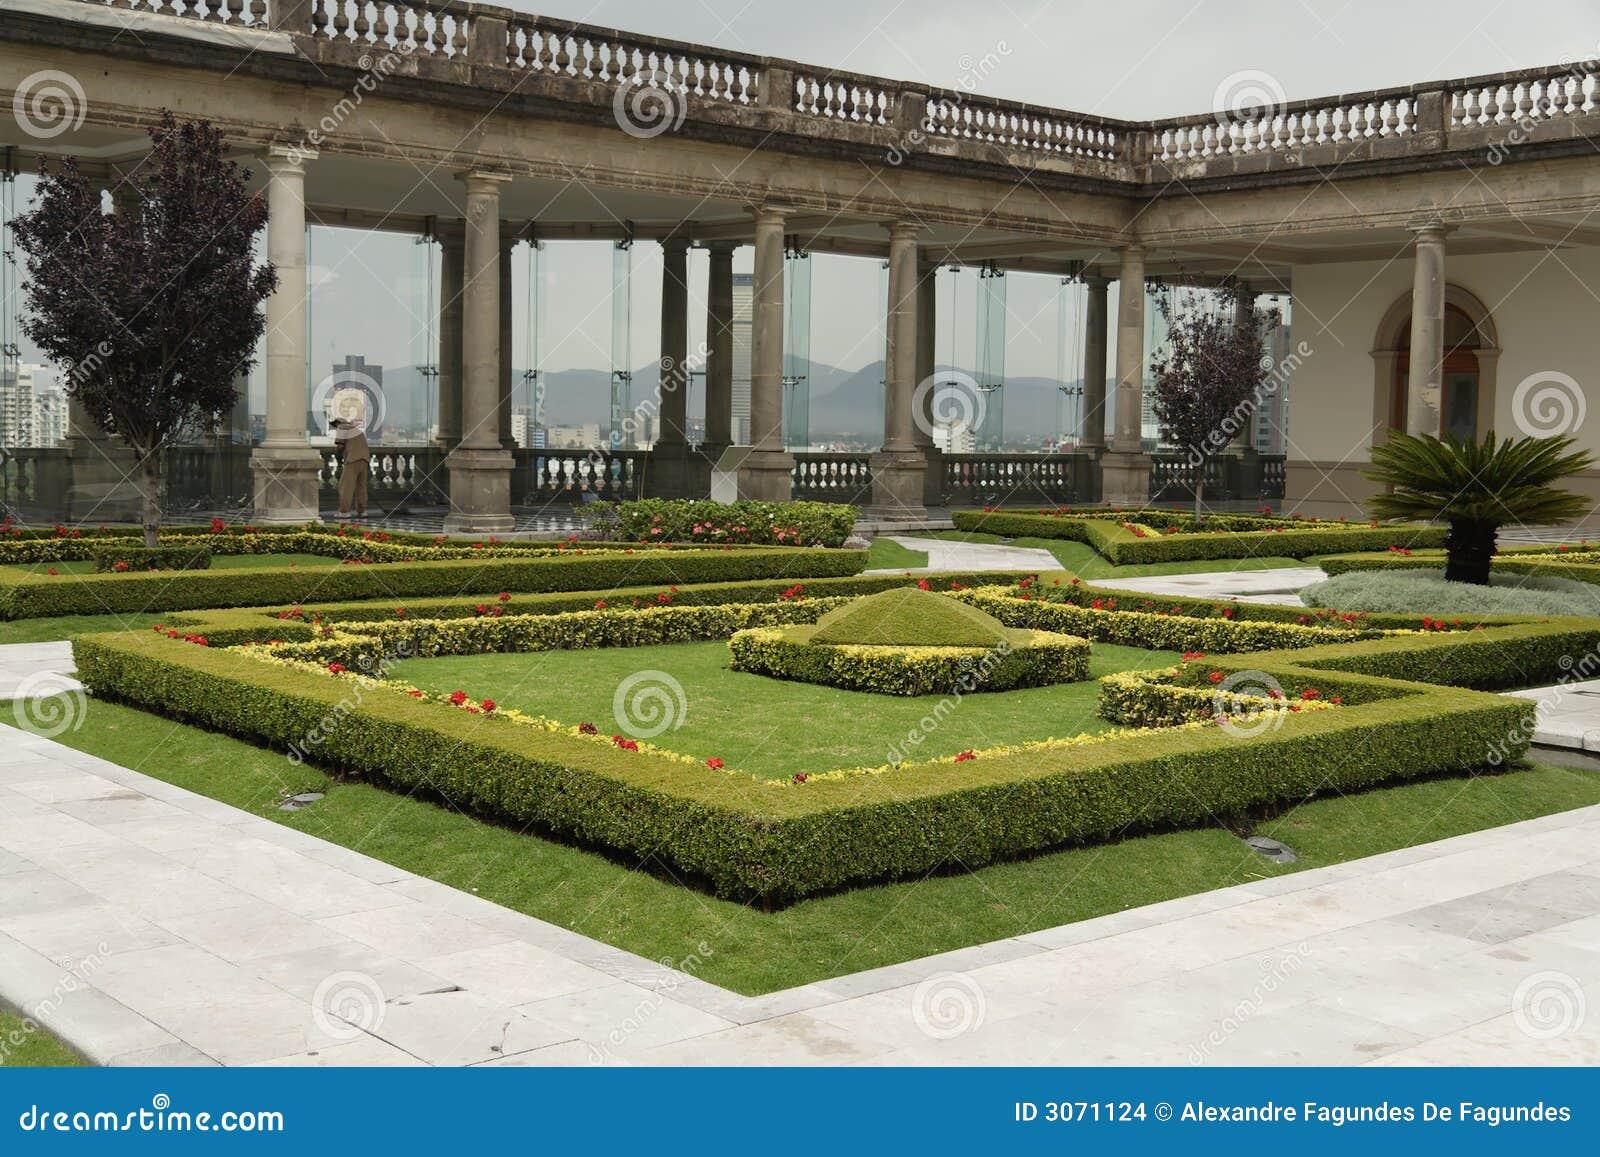 Chapultepec Castle Garden Mexico City